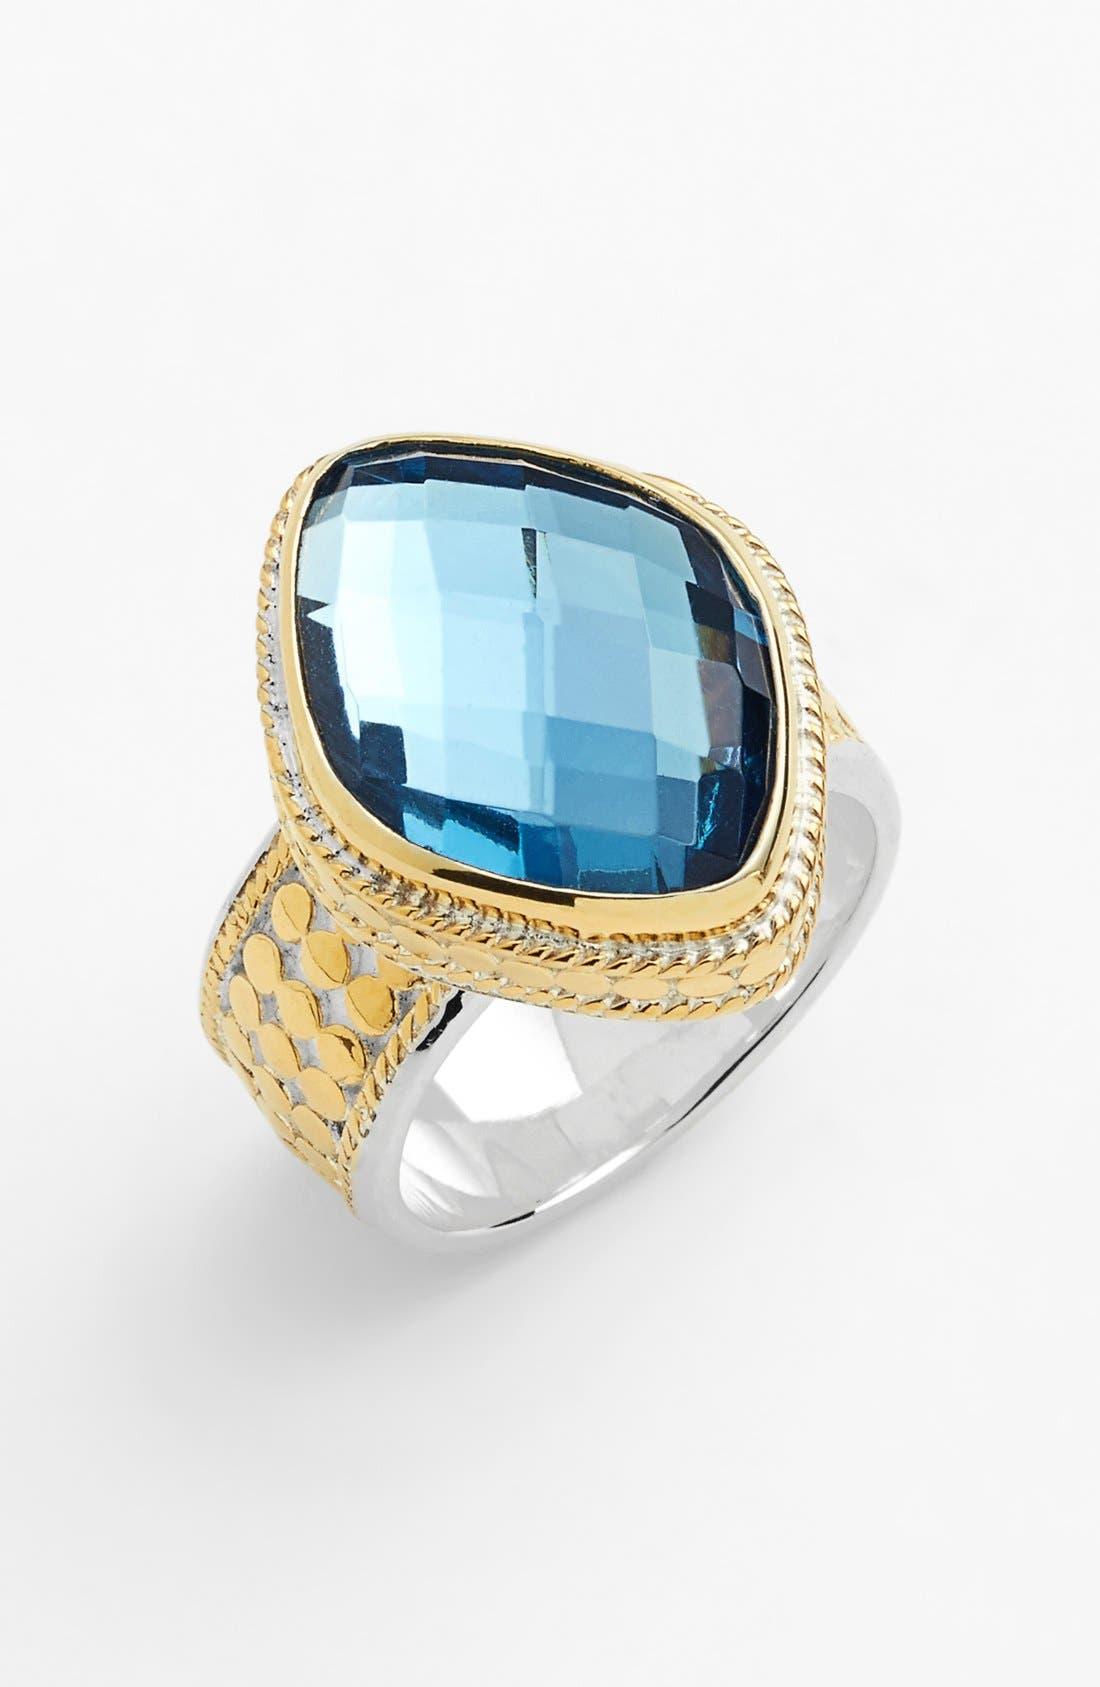 Alternate Image 1 Selected - Anna Beck 'Gili' Stone Ring